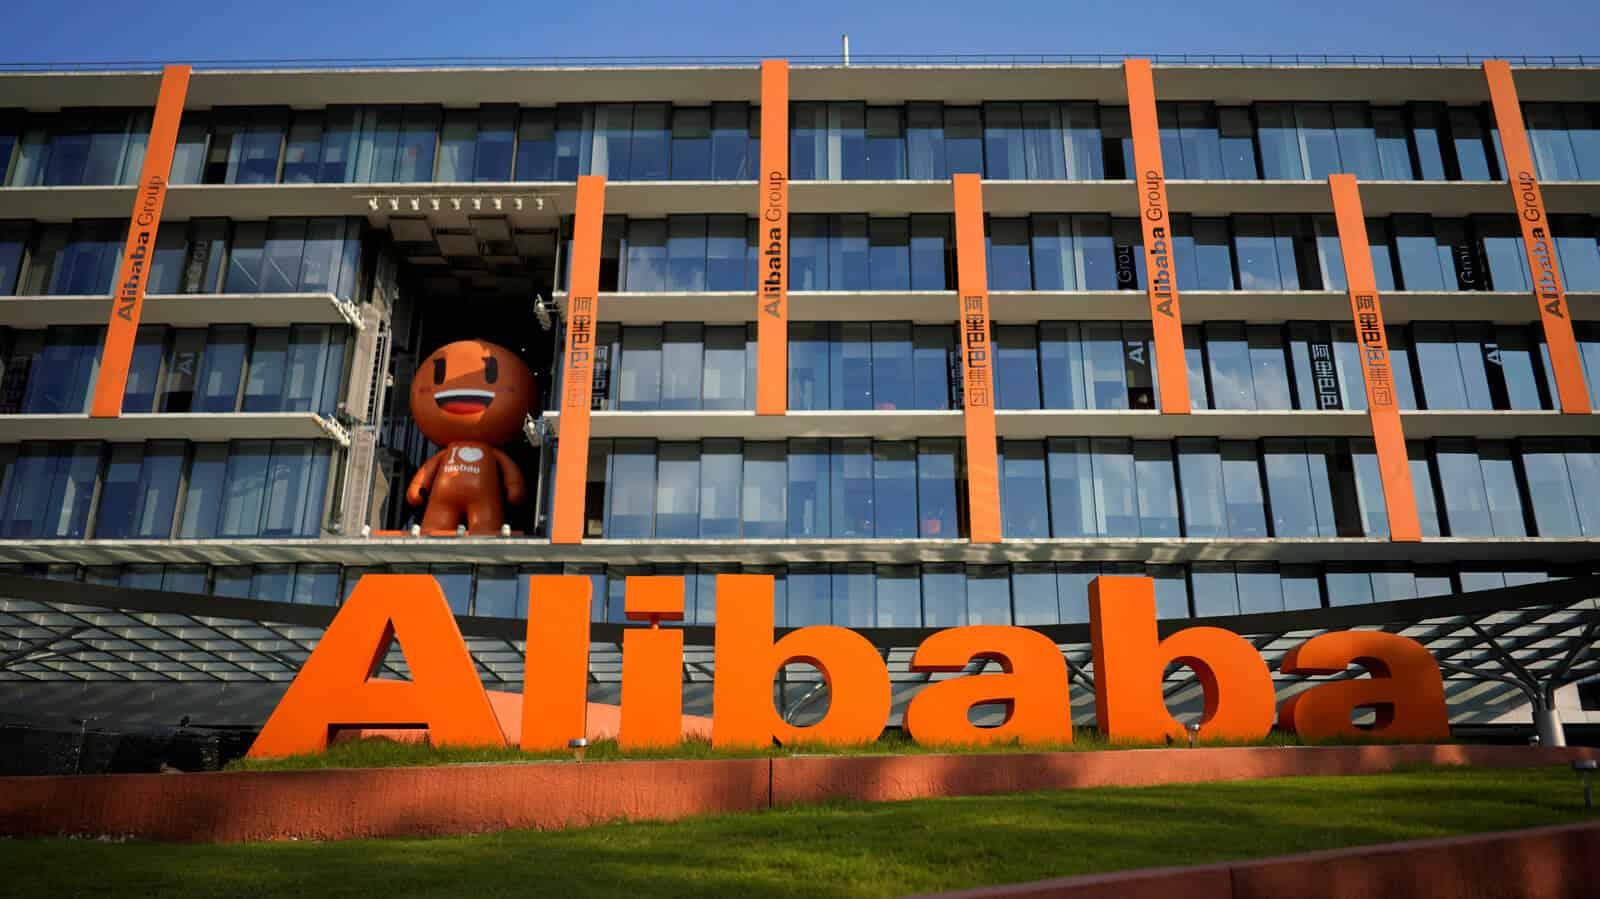 China's e-commerce giant Alibaba hit with antitrust probe